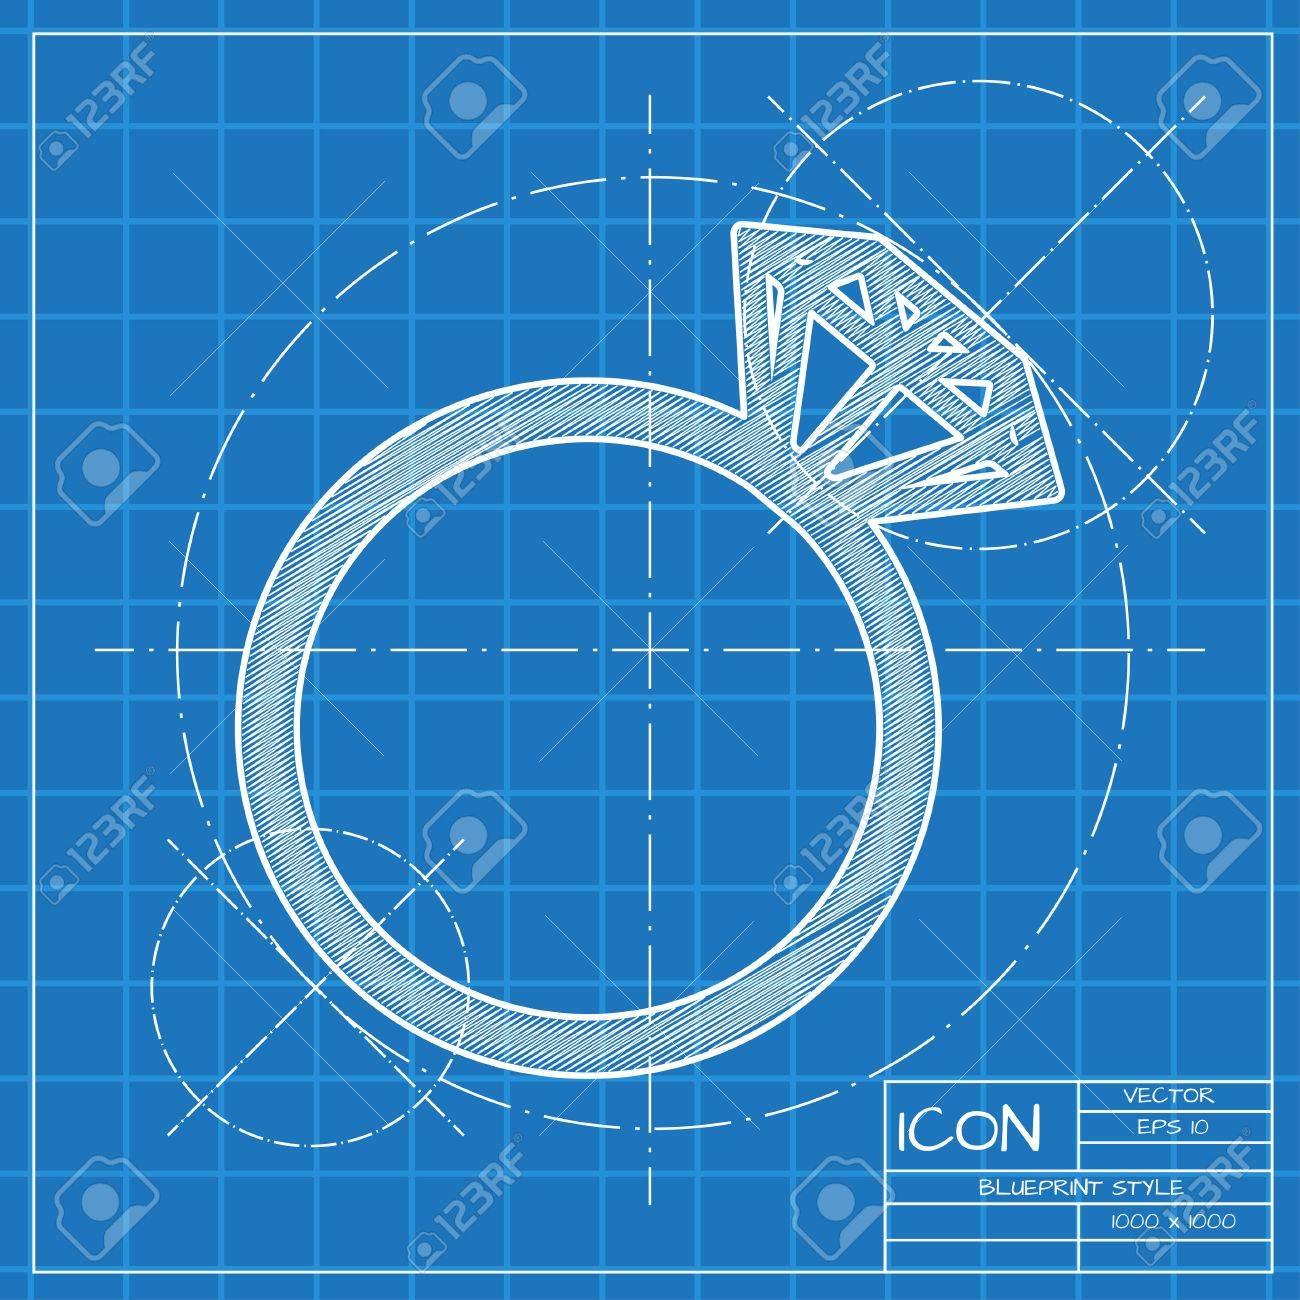 Vector blueprint wedding ring icon engineer and architect vector blueprint wedding ring icon engineer and architect background stock vector 45426053 malvernweather Gallery